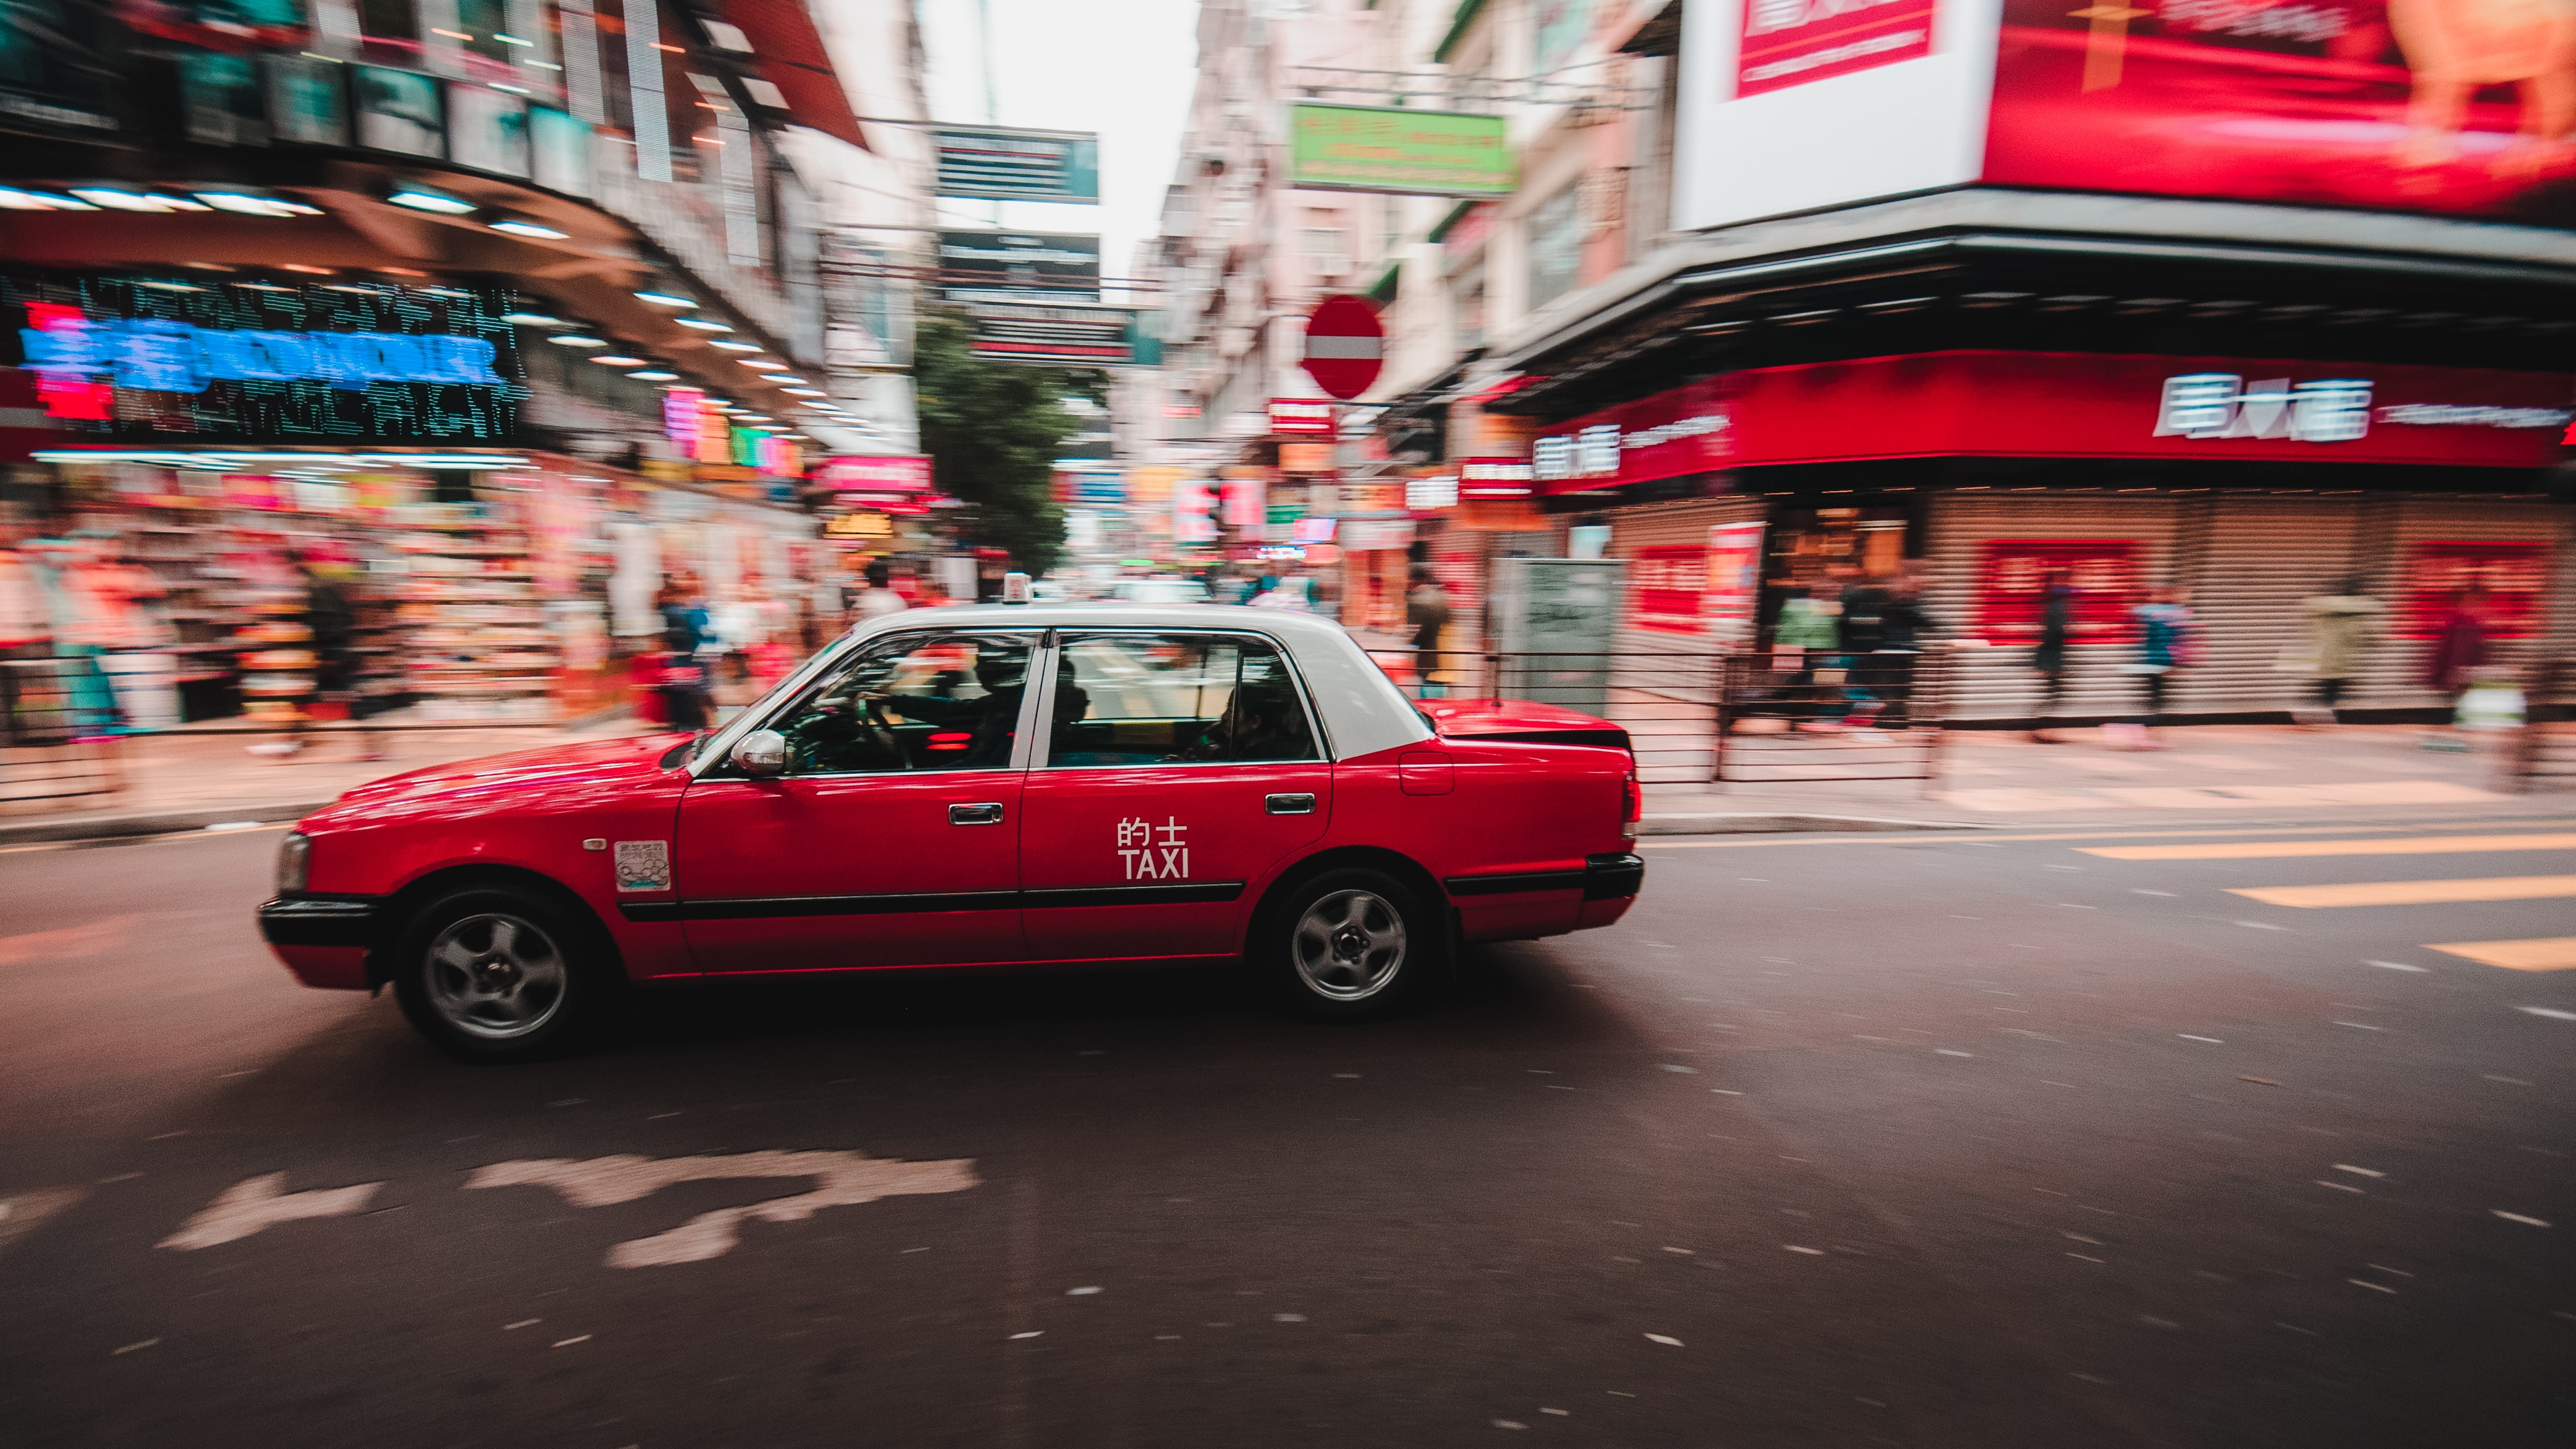 red and white sedan